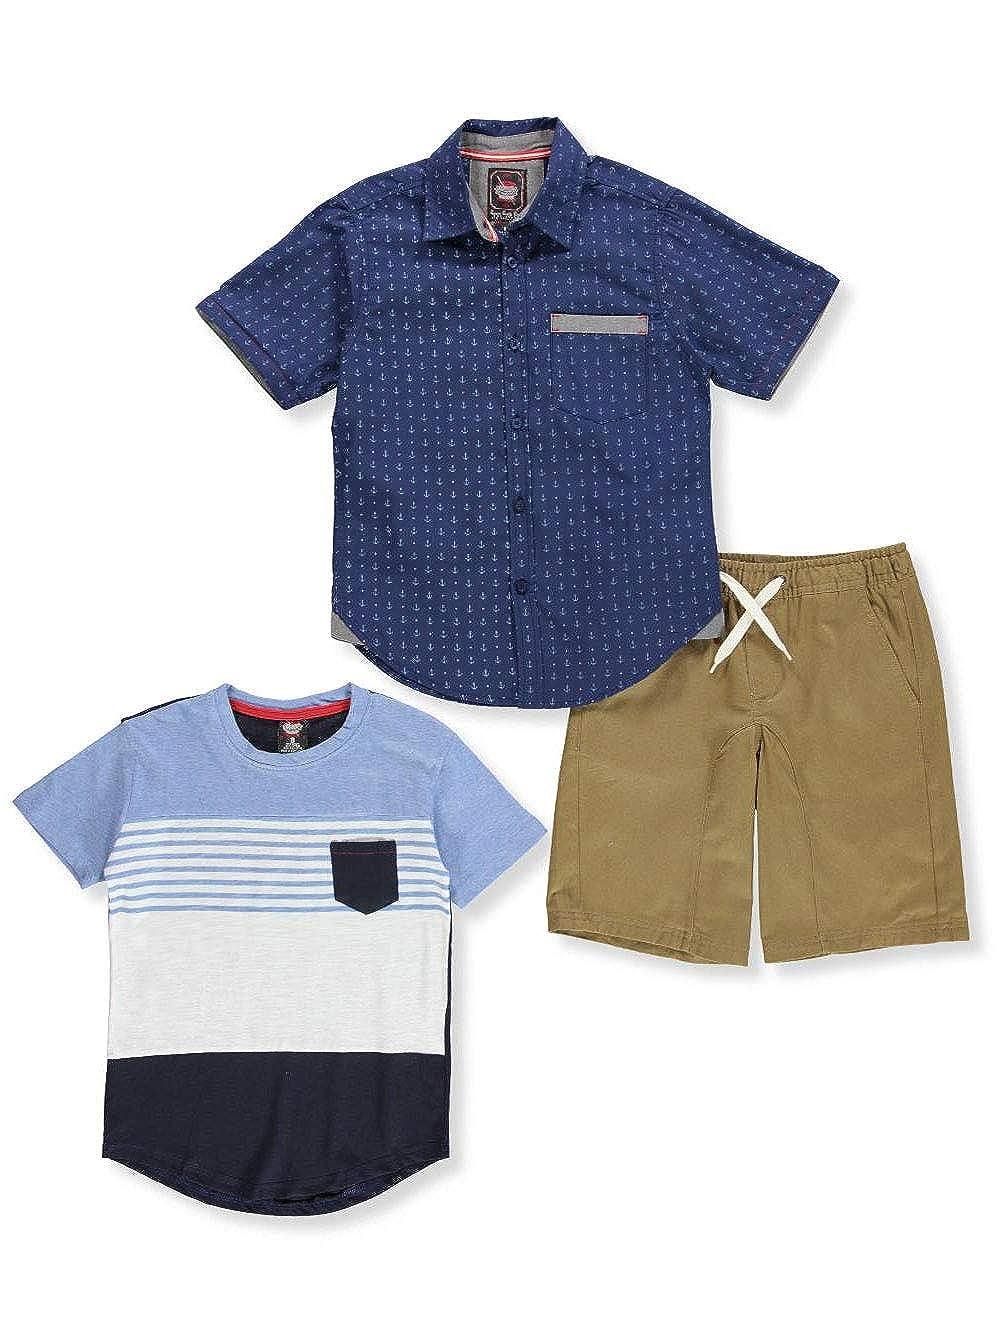 Retro Stitch Boys 3-Piece Shorts Set Outfit